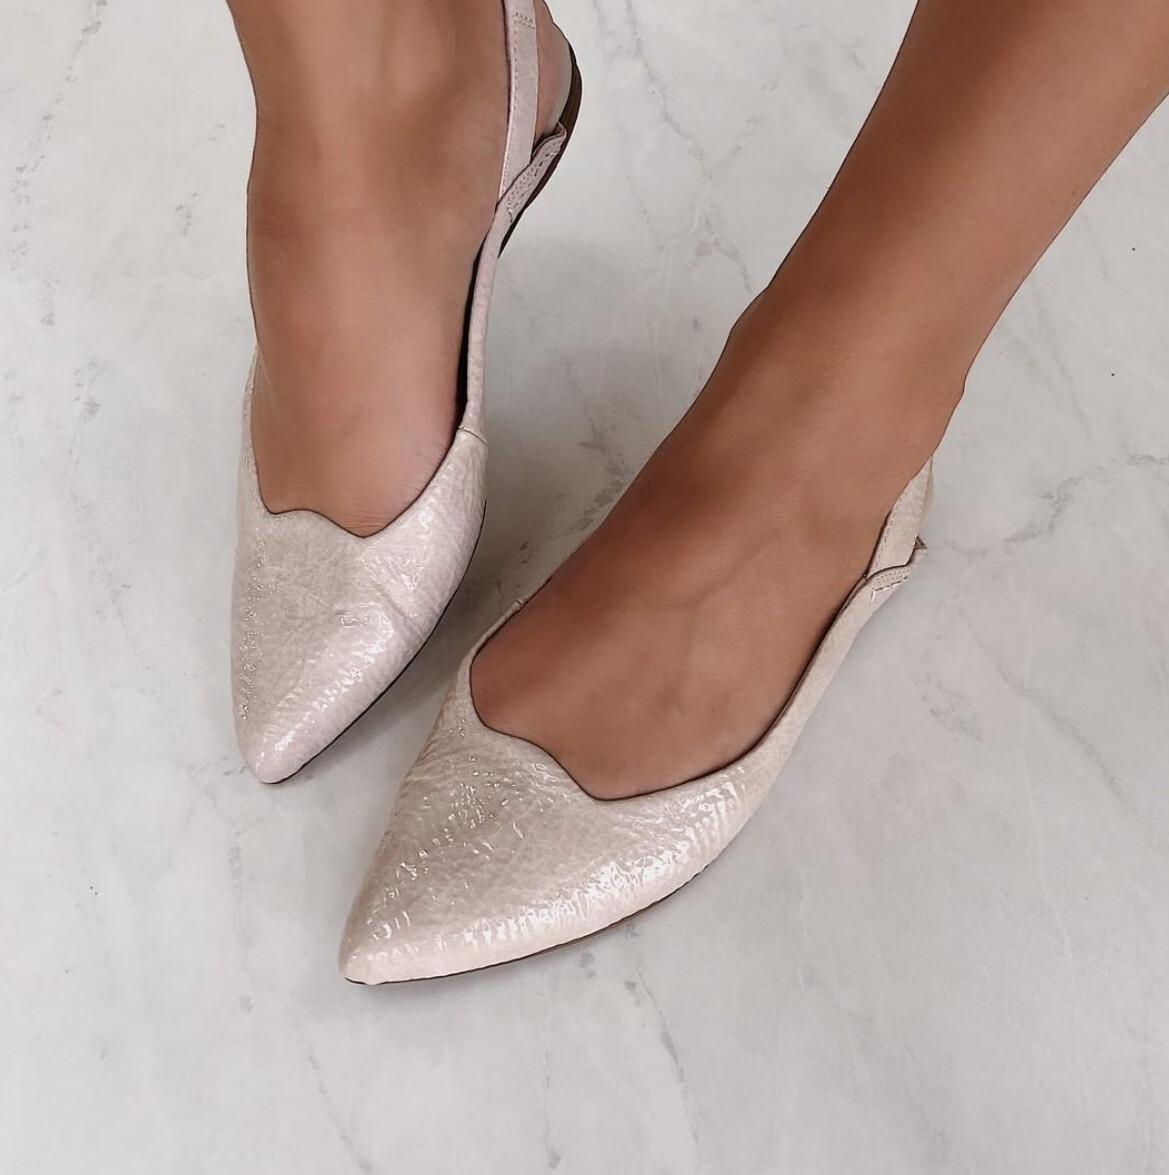 Naked Feet -Leva-